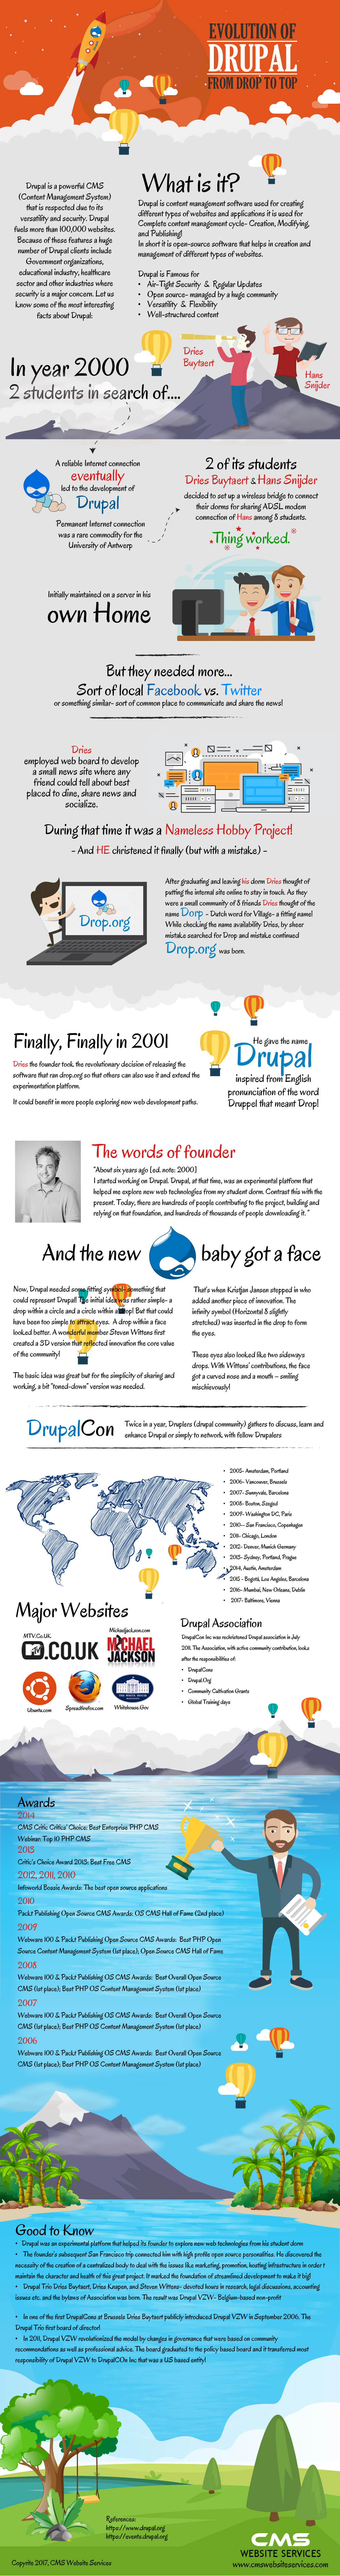 Drupal history